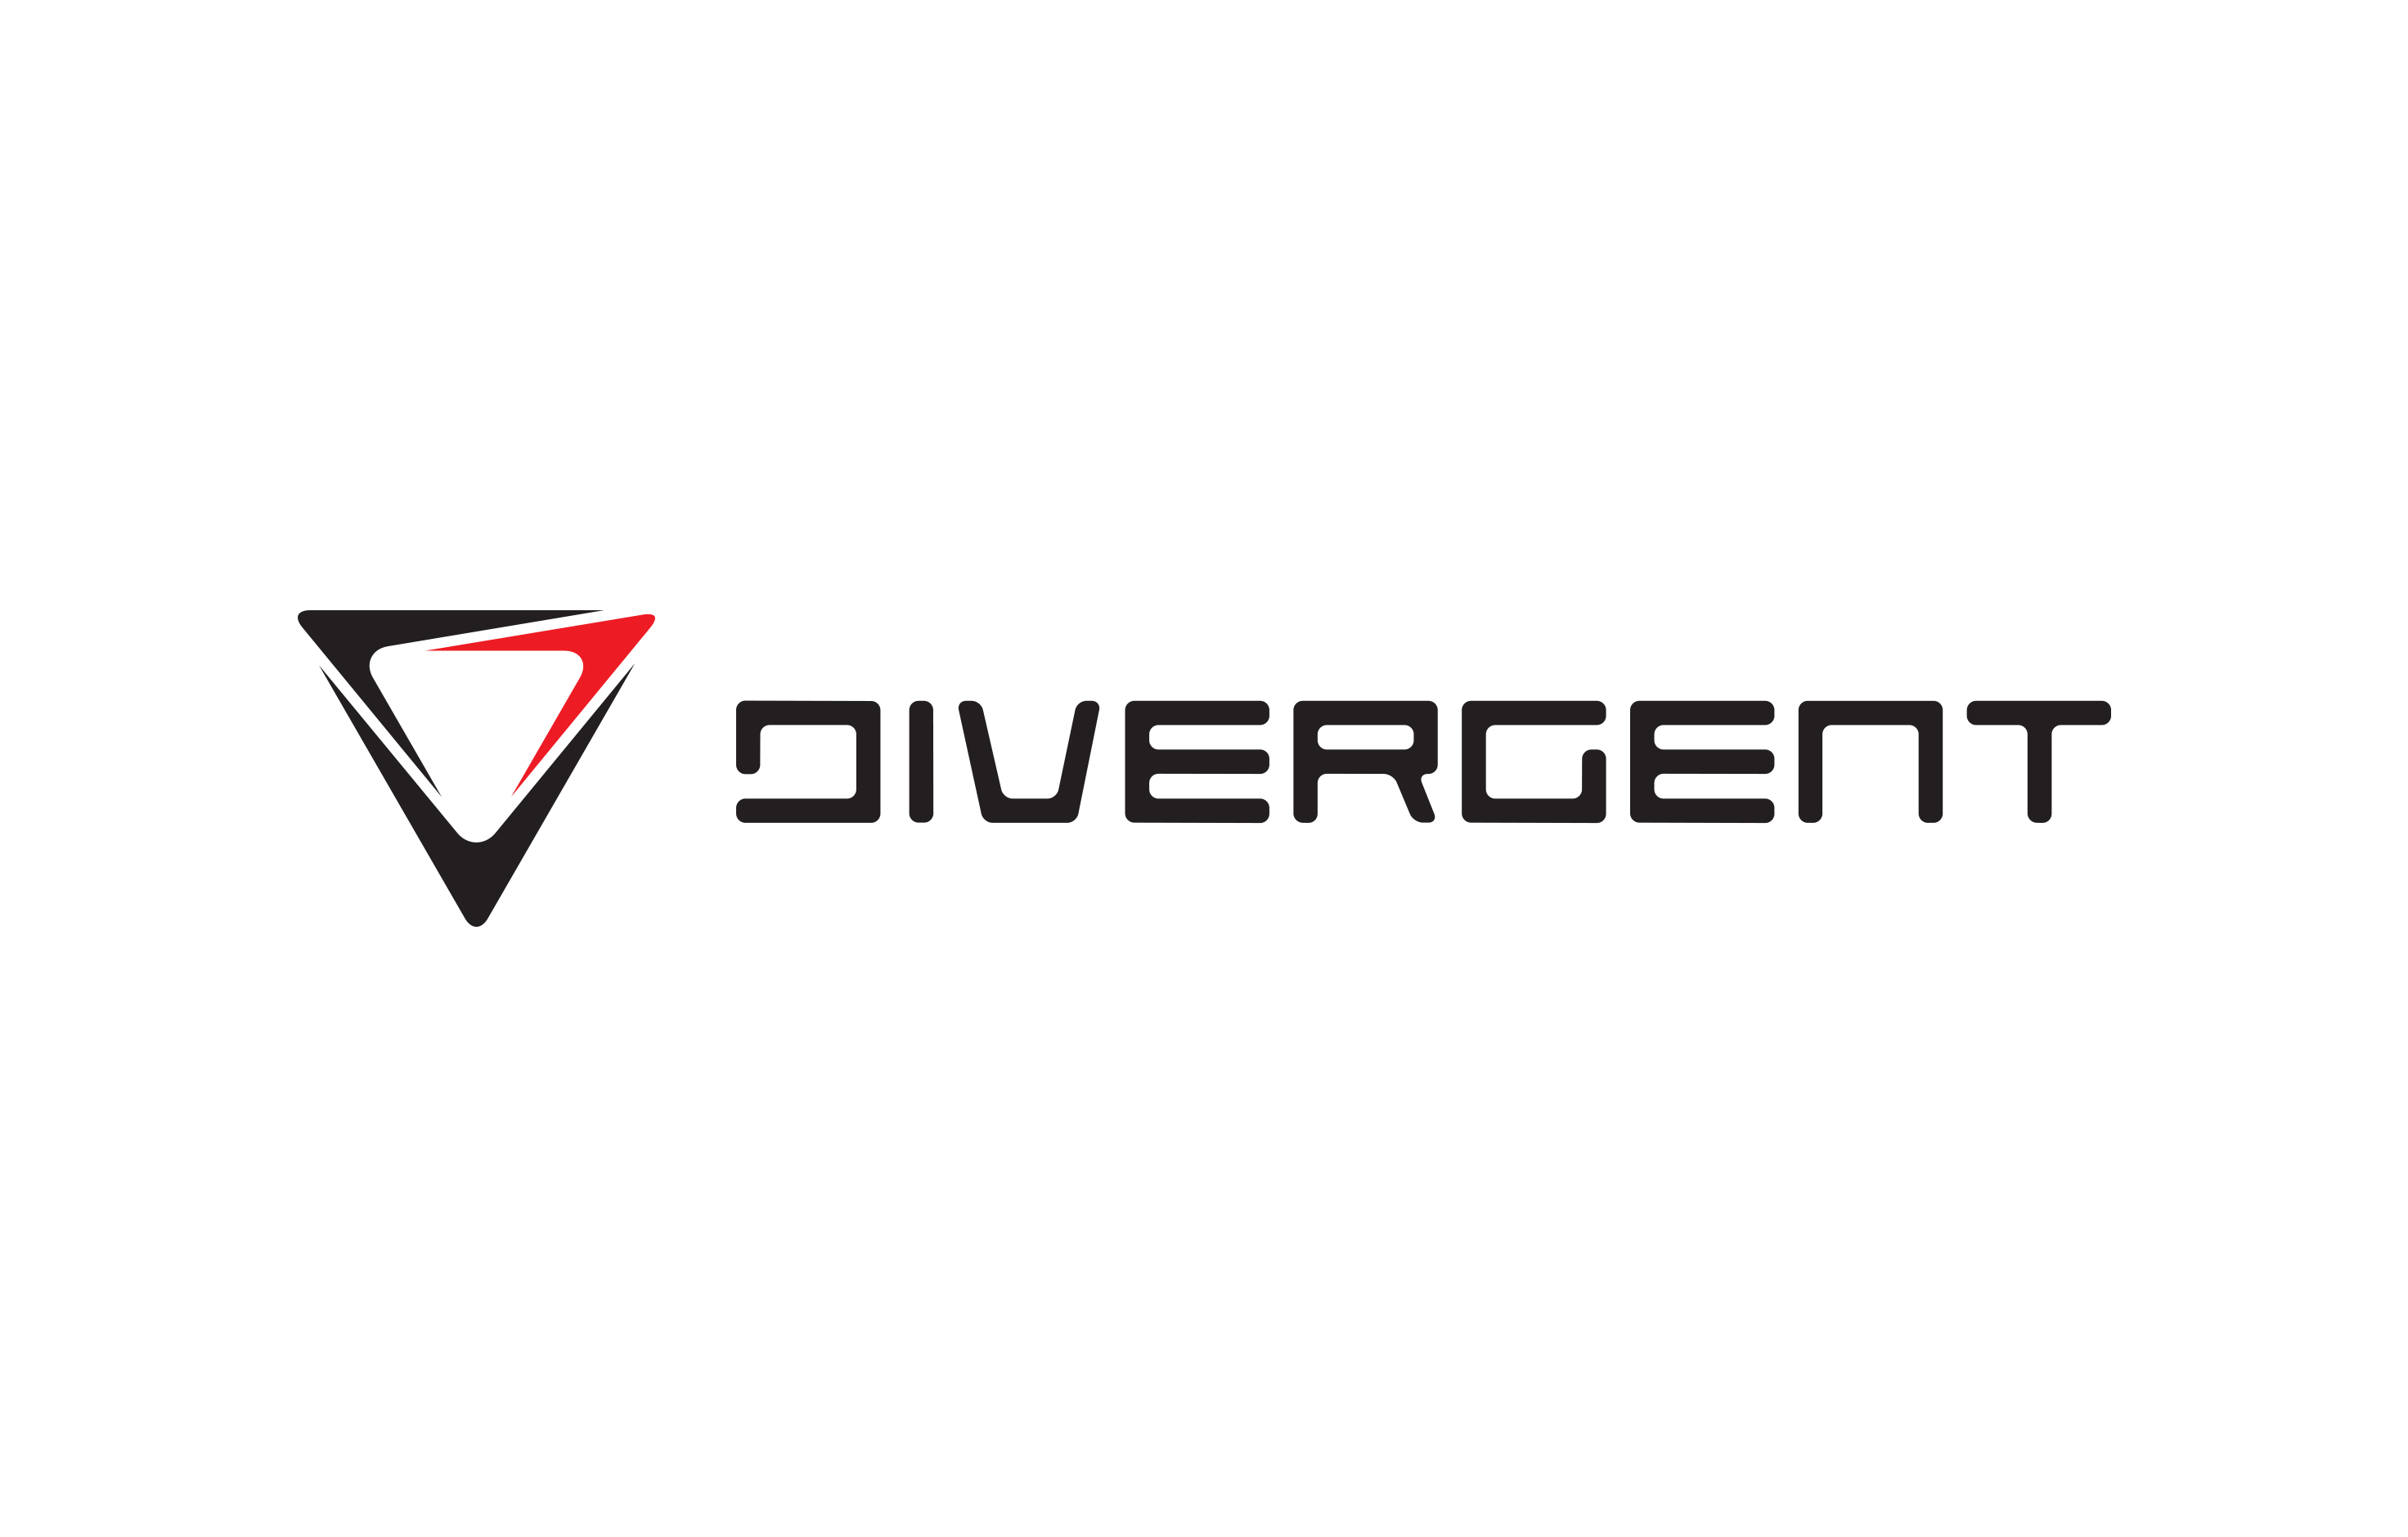 Divergent3d